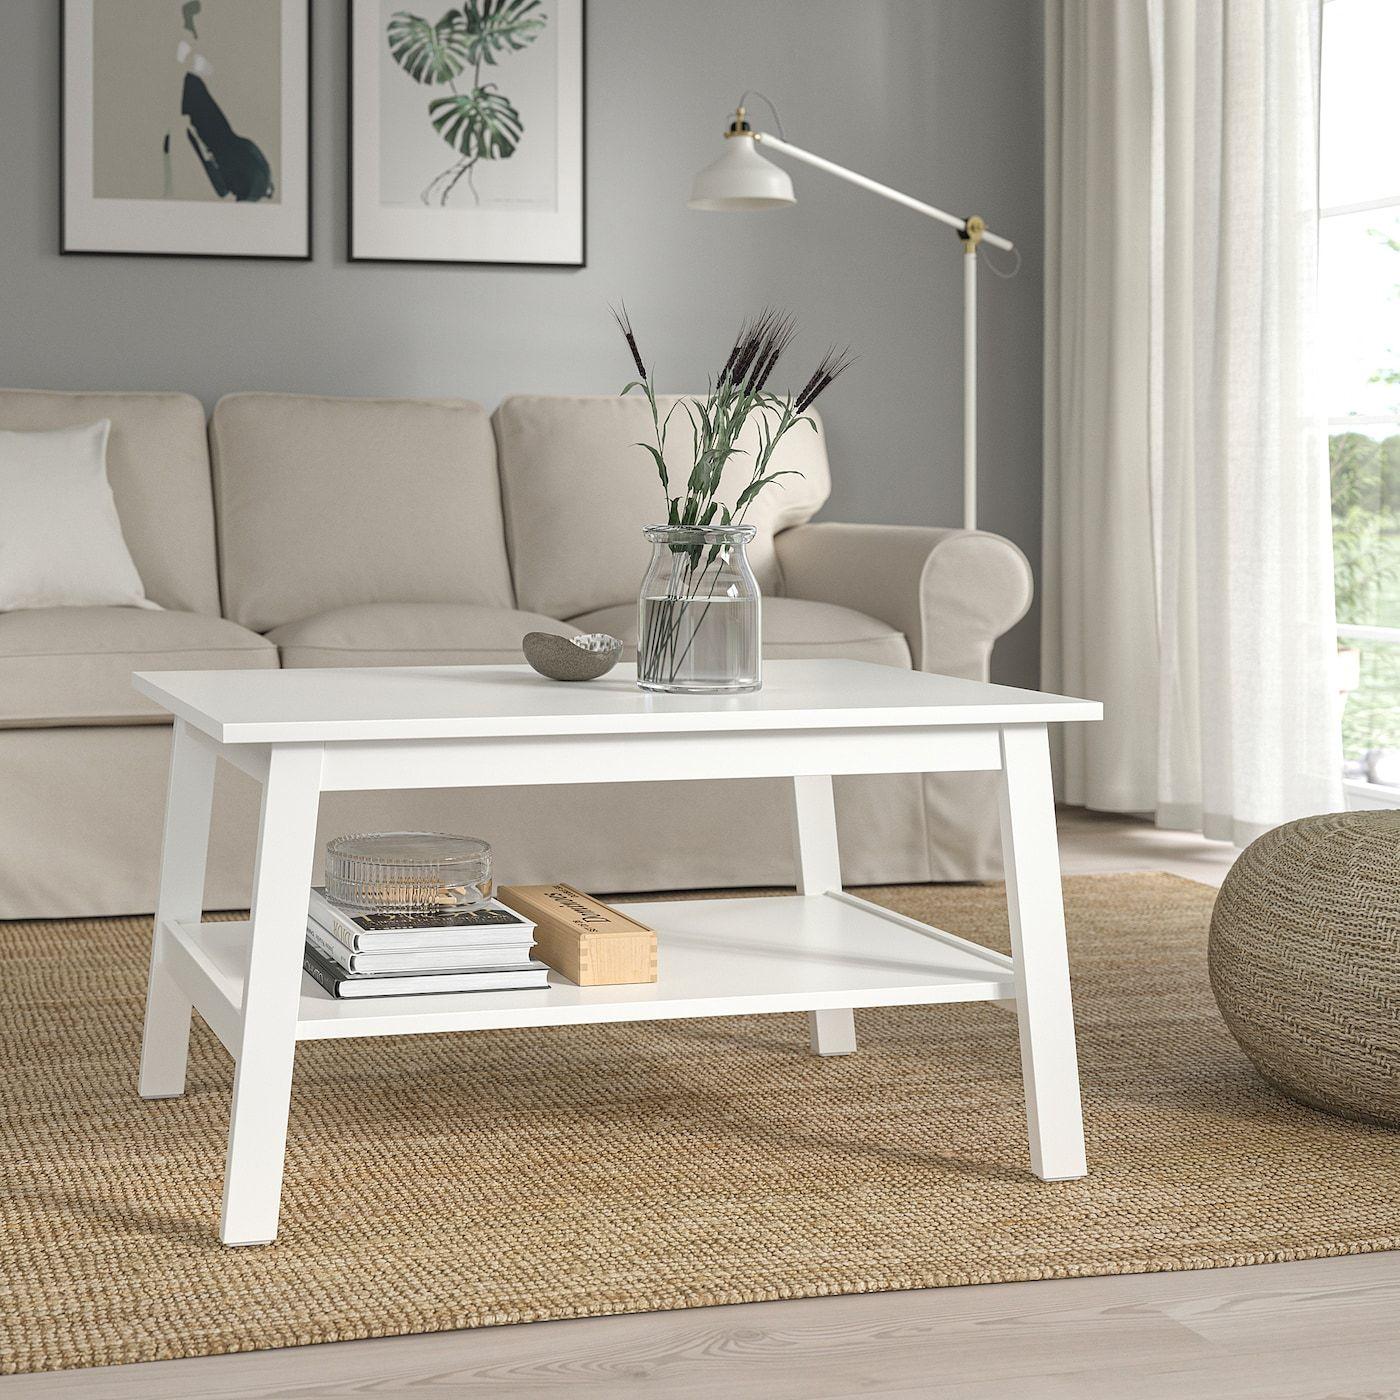 Lunnarp Soffbord Vit 90x55 Cm Ikea Ikea Coffee Table Coffee Table White Coffee Table [ 1400 x 1400 Pixel ]